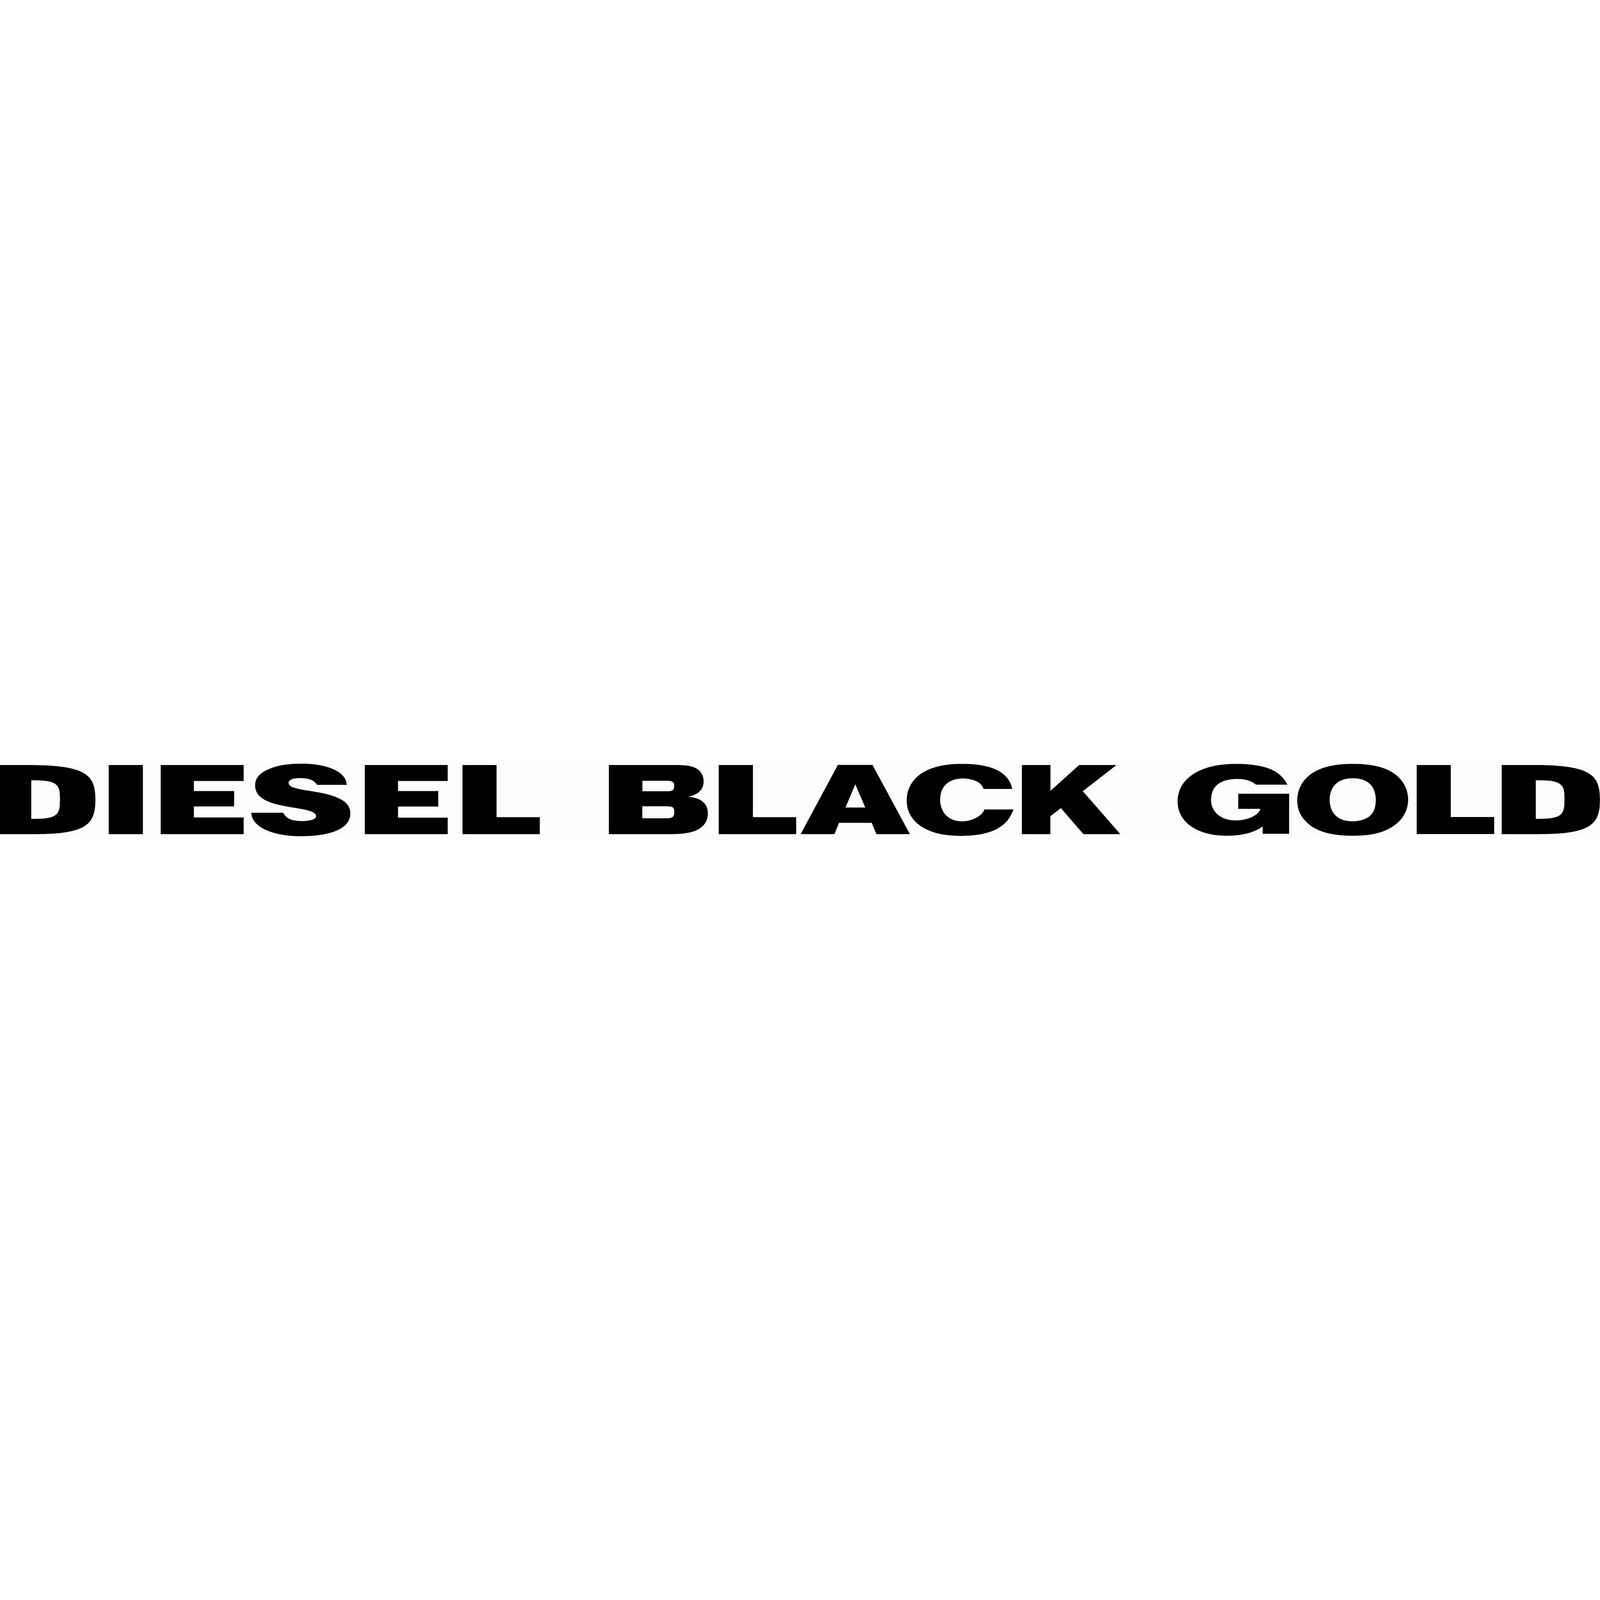 DIESEL BLACK GOLD (Image 1)